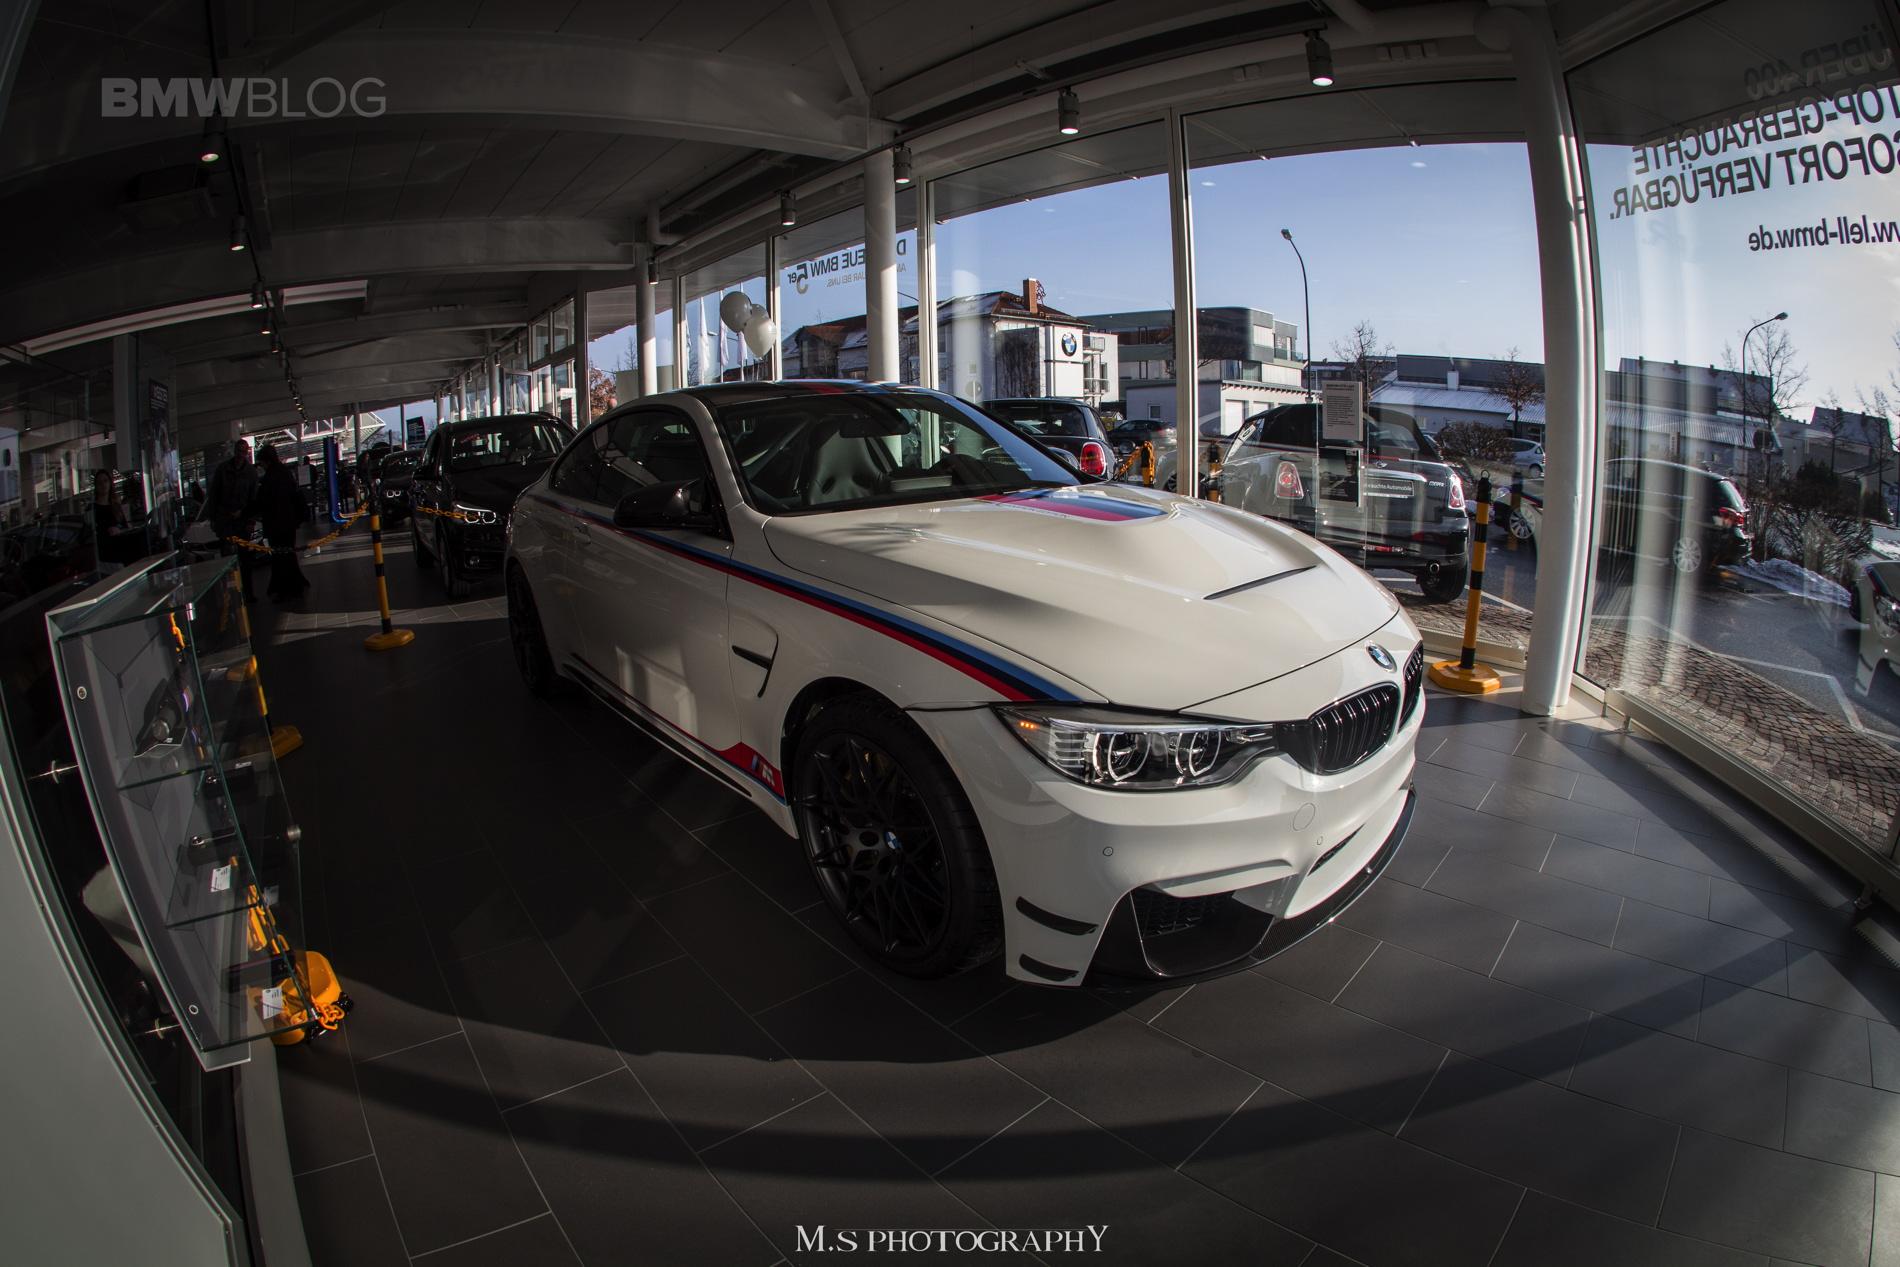 BMW M4 DTM Champion Edition 1st